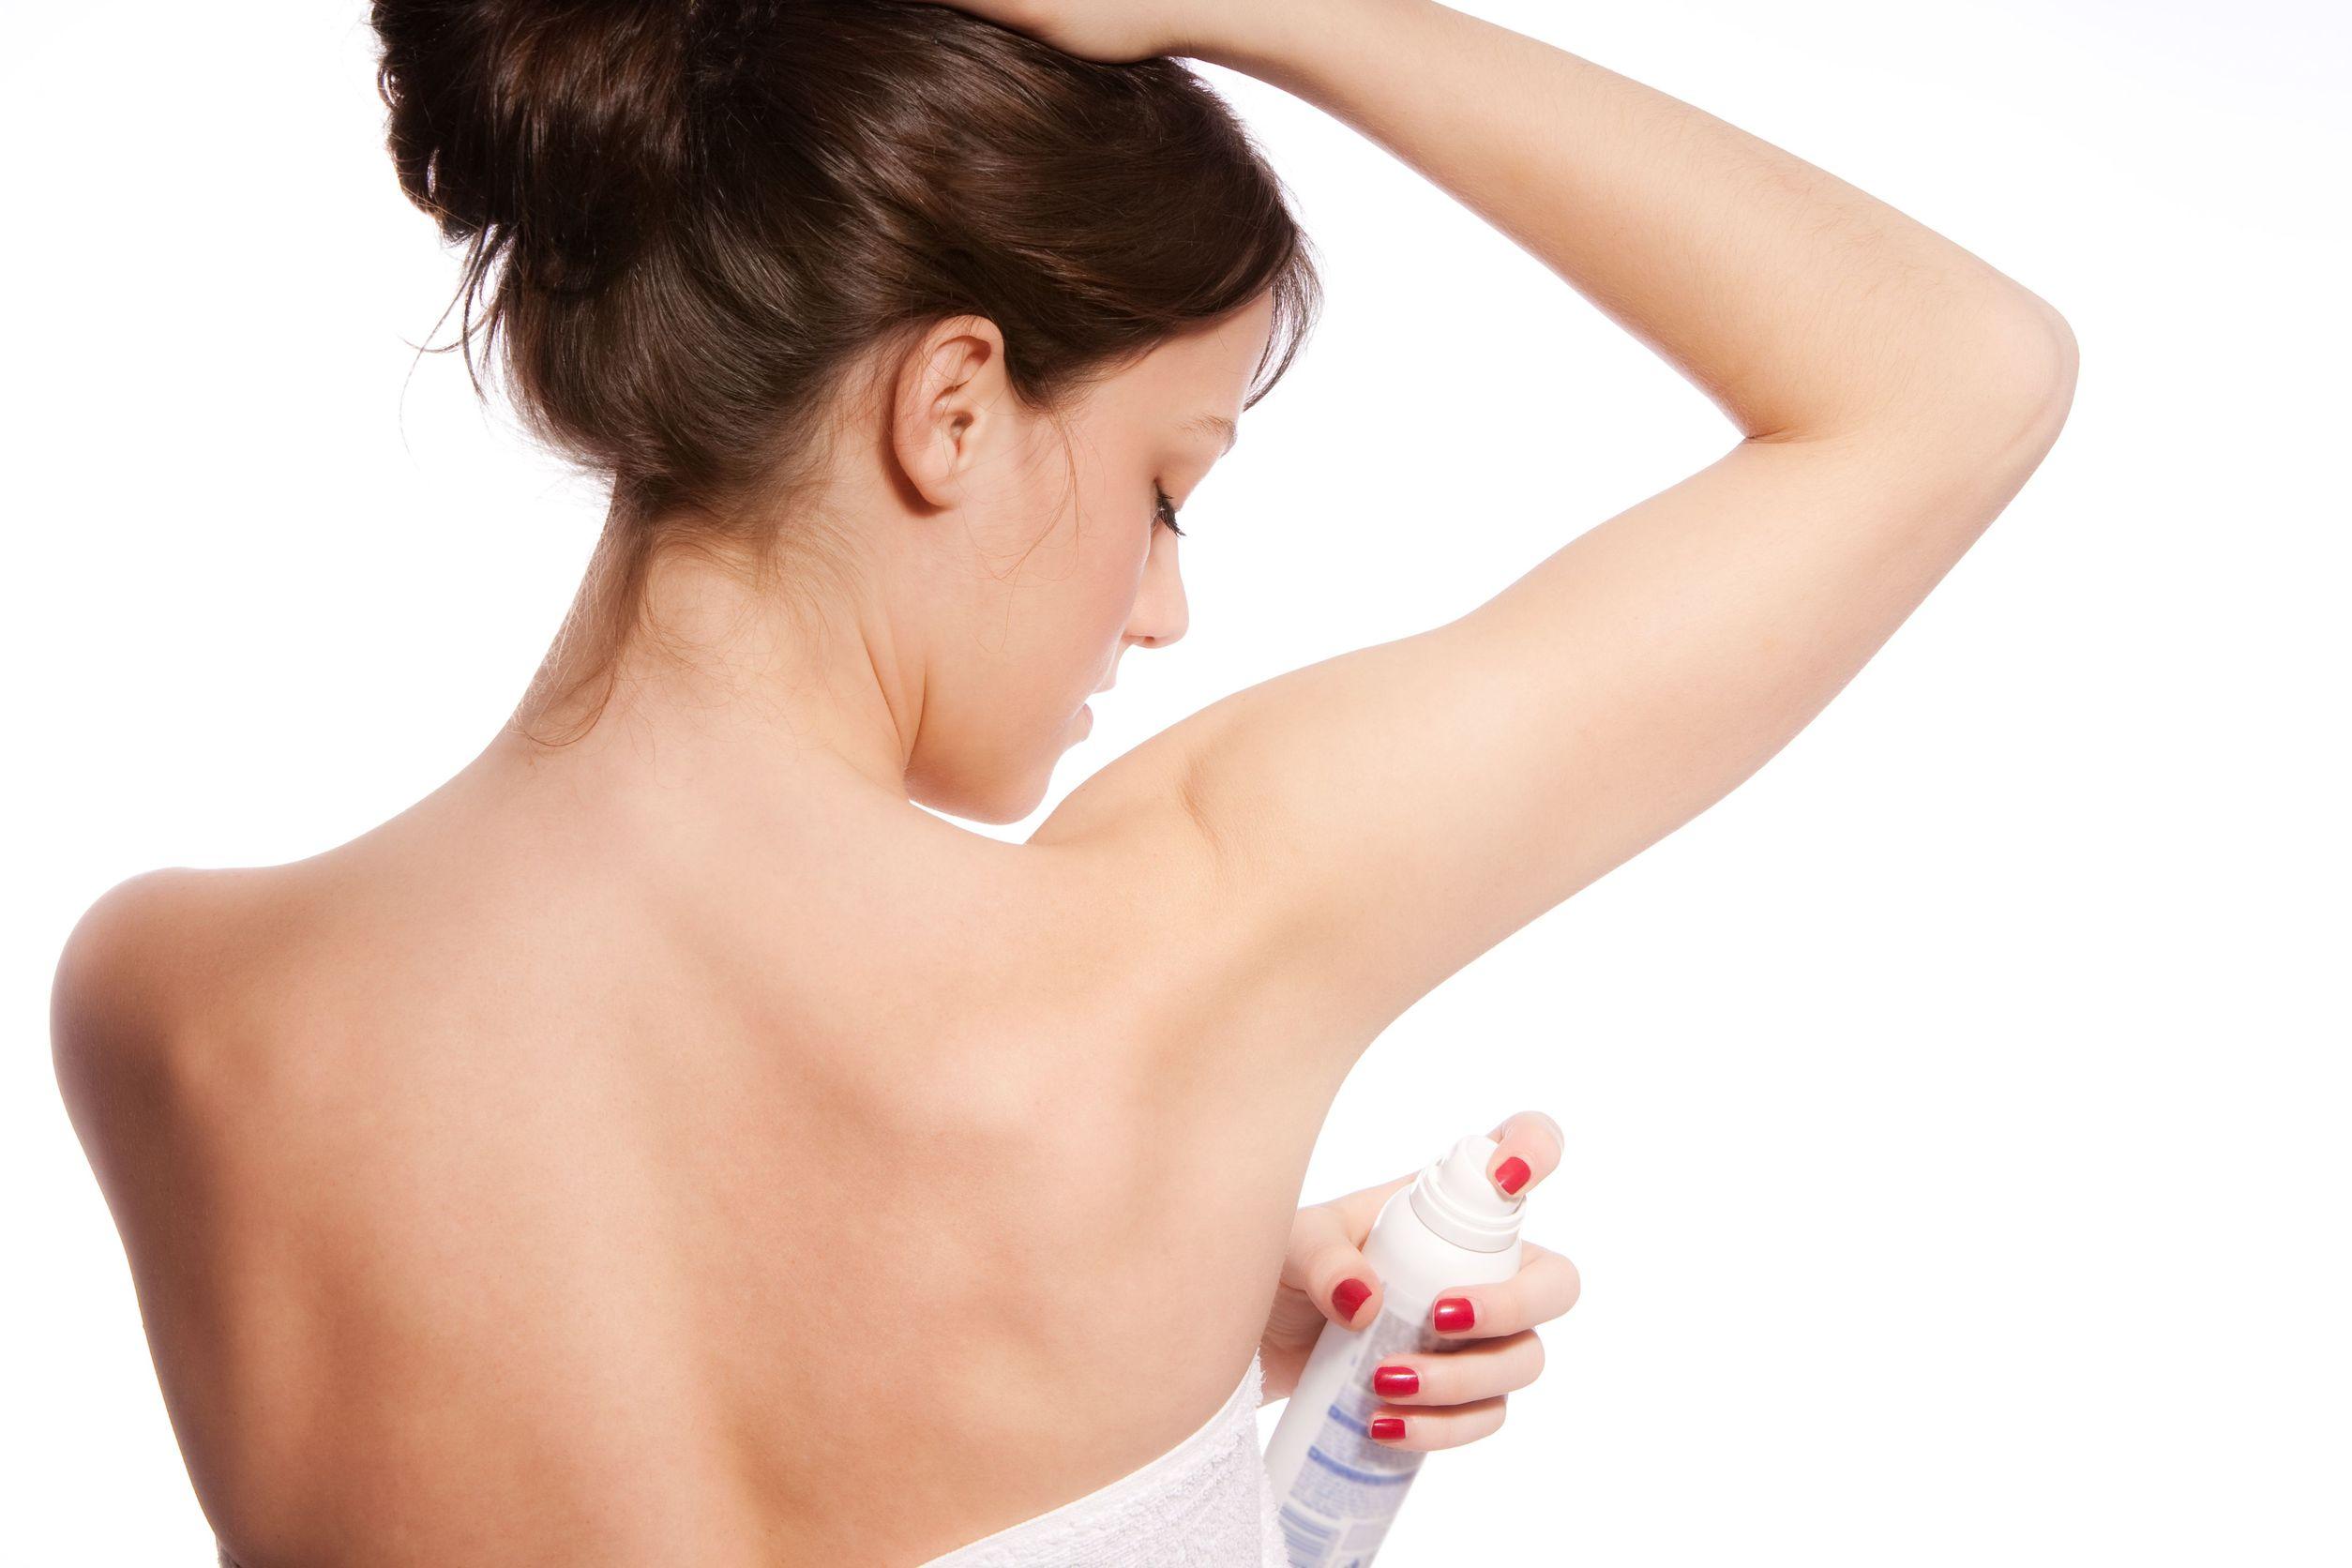 woman deodorant